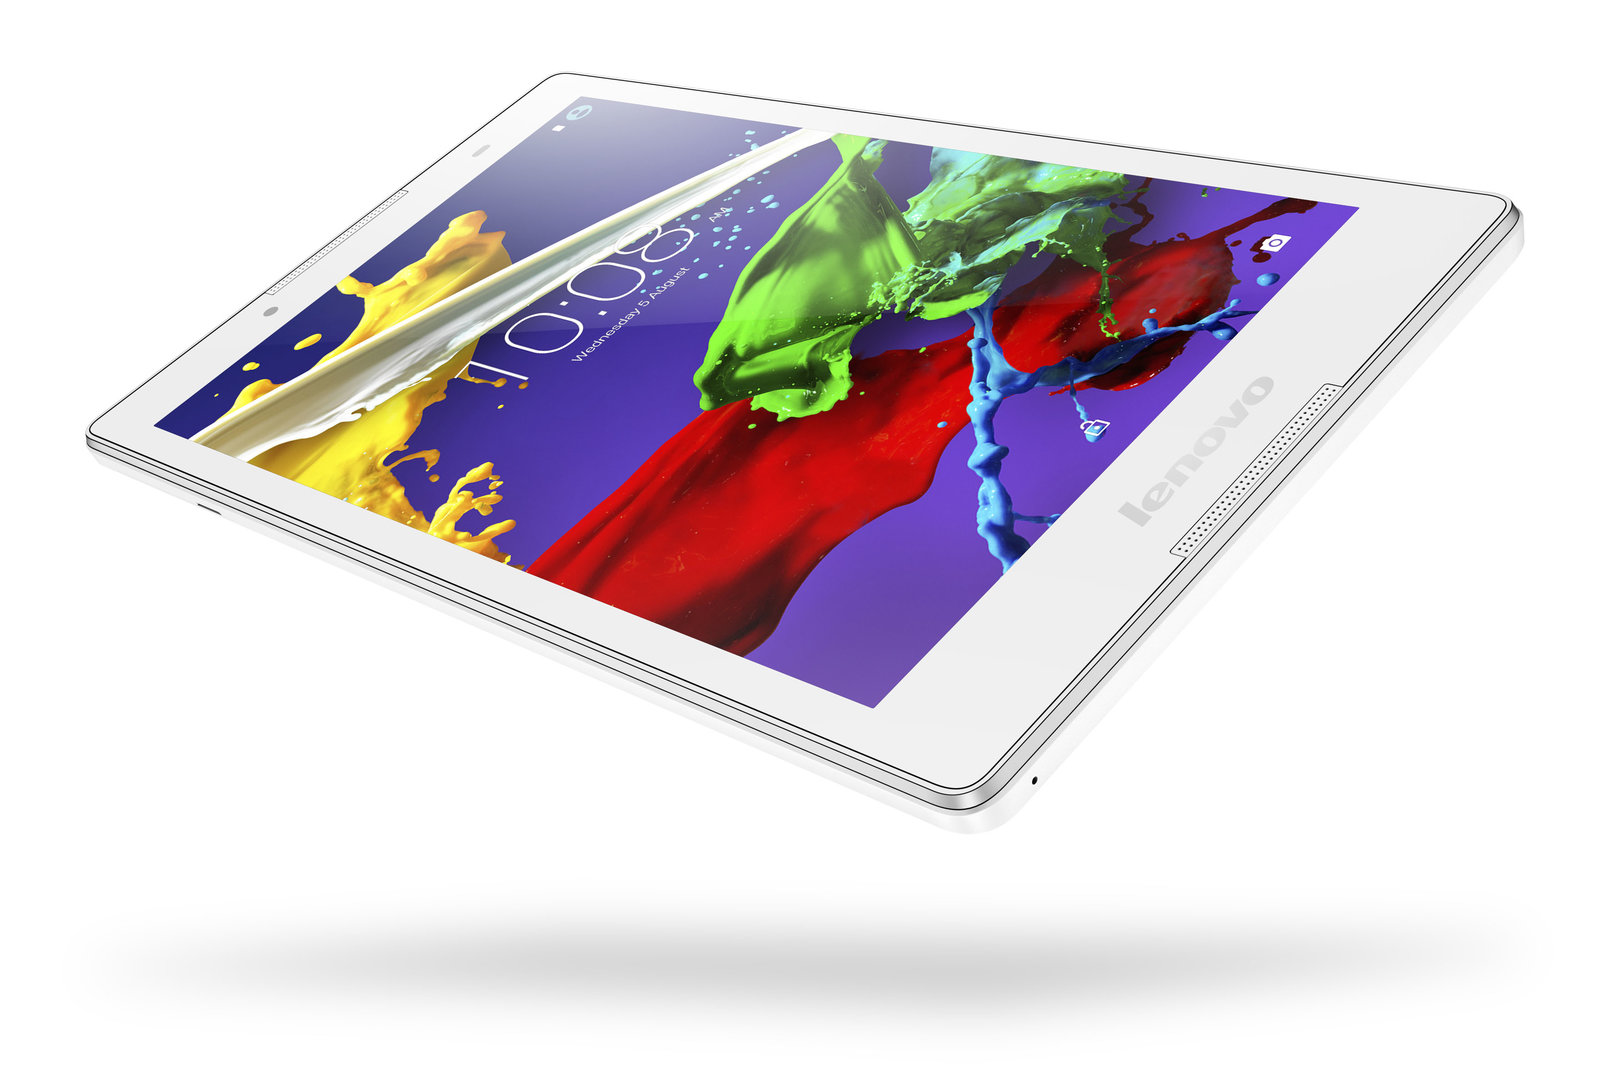 Lenovo Tab 2 A8 vorgestellt